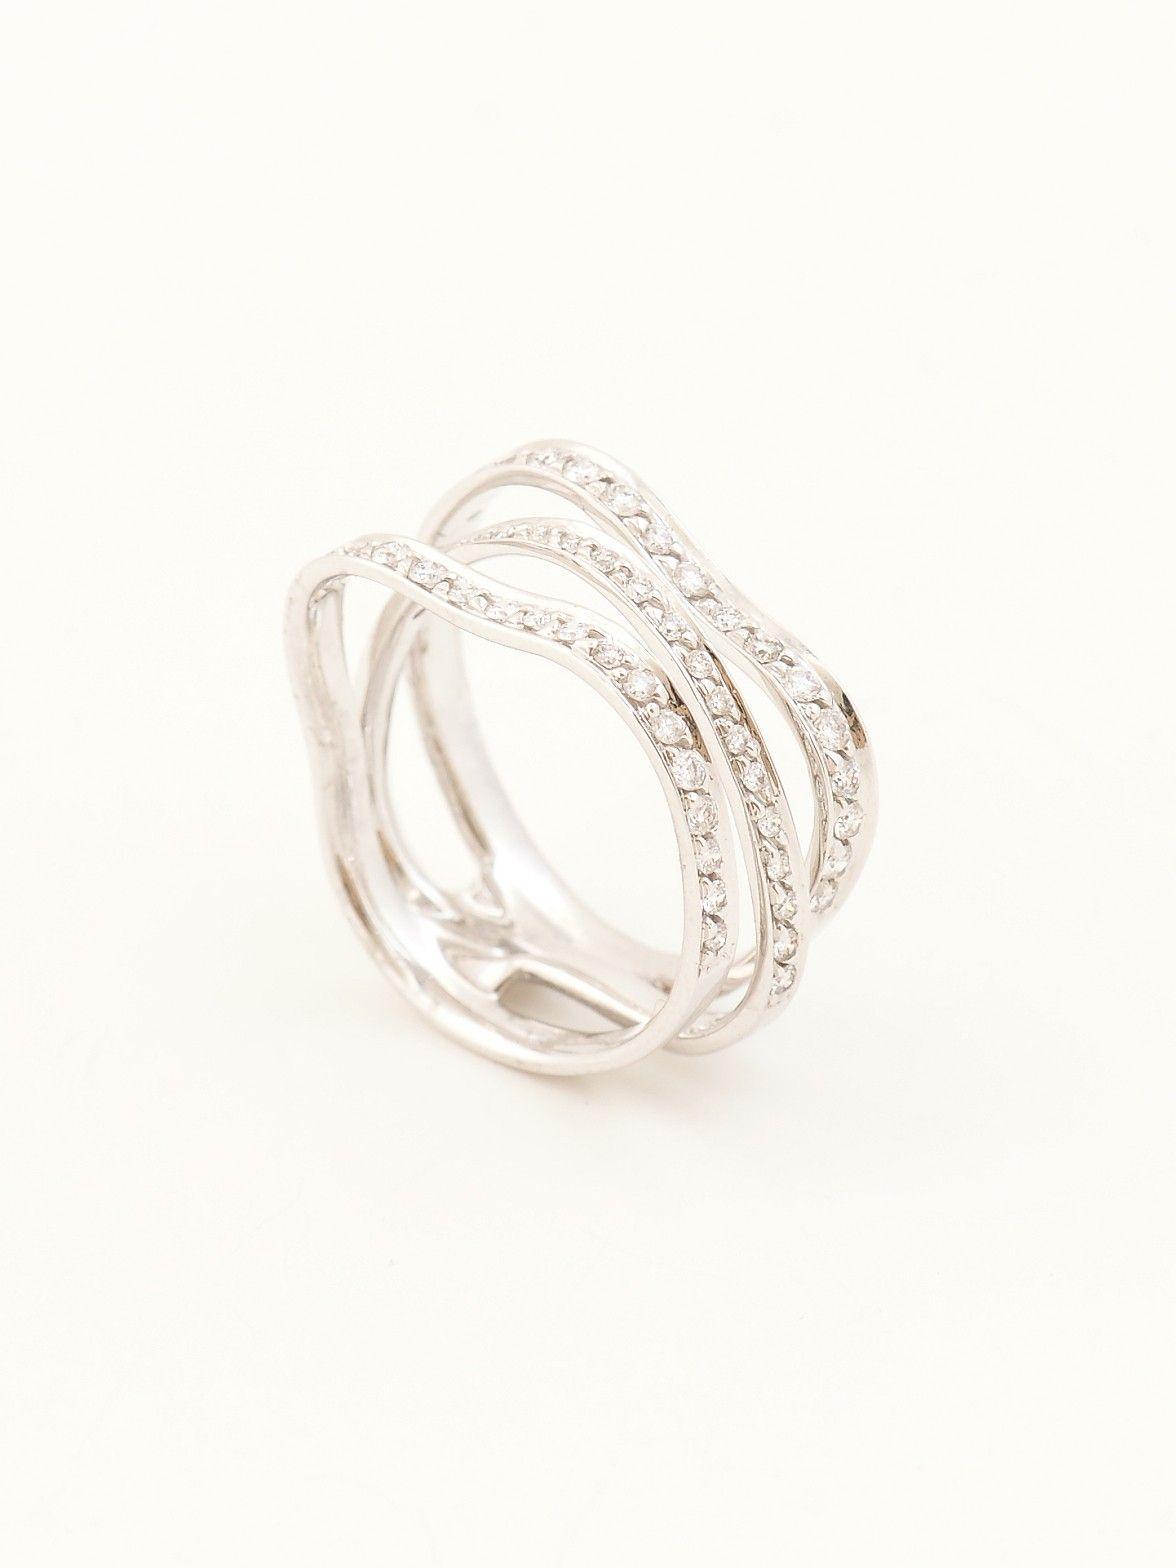 H.Stern Oscar Niemeyer Diamond Ring - H.Stern 18k White Gold Oscar ...